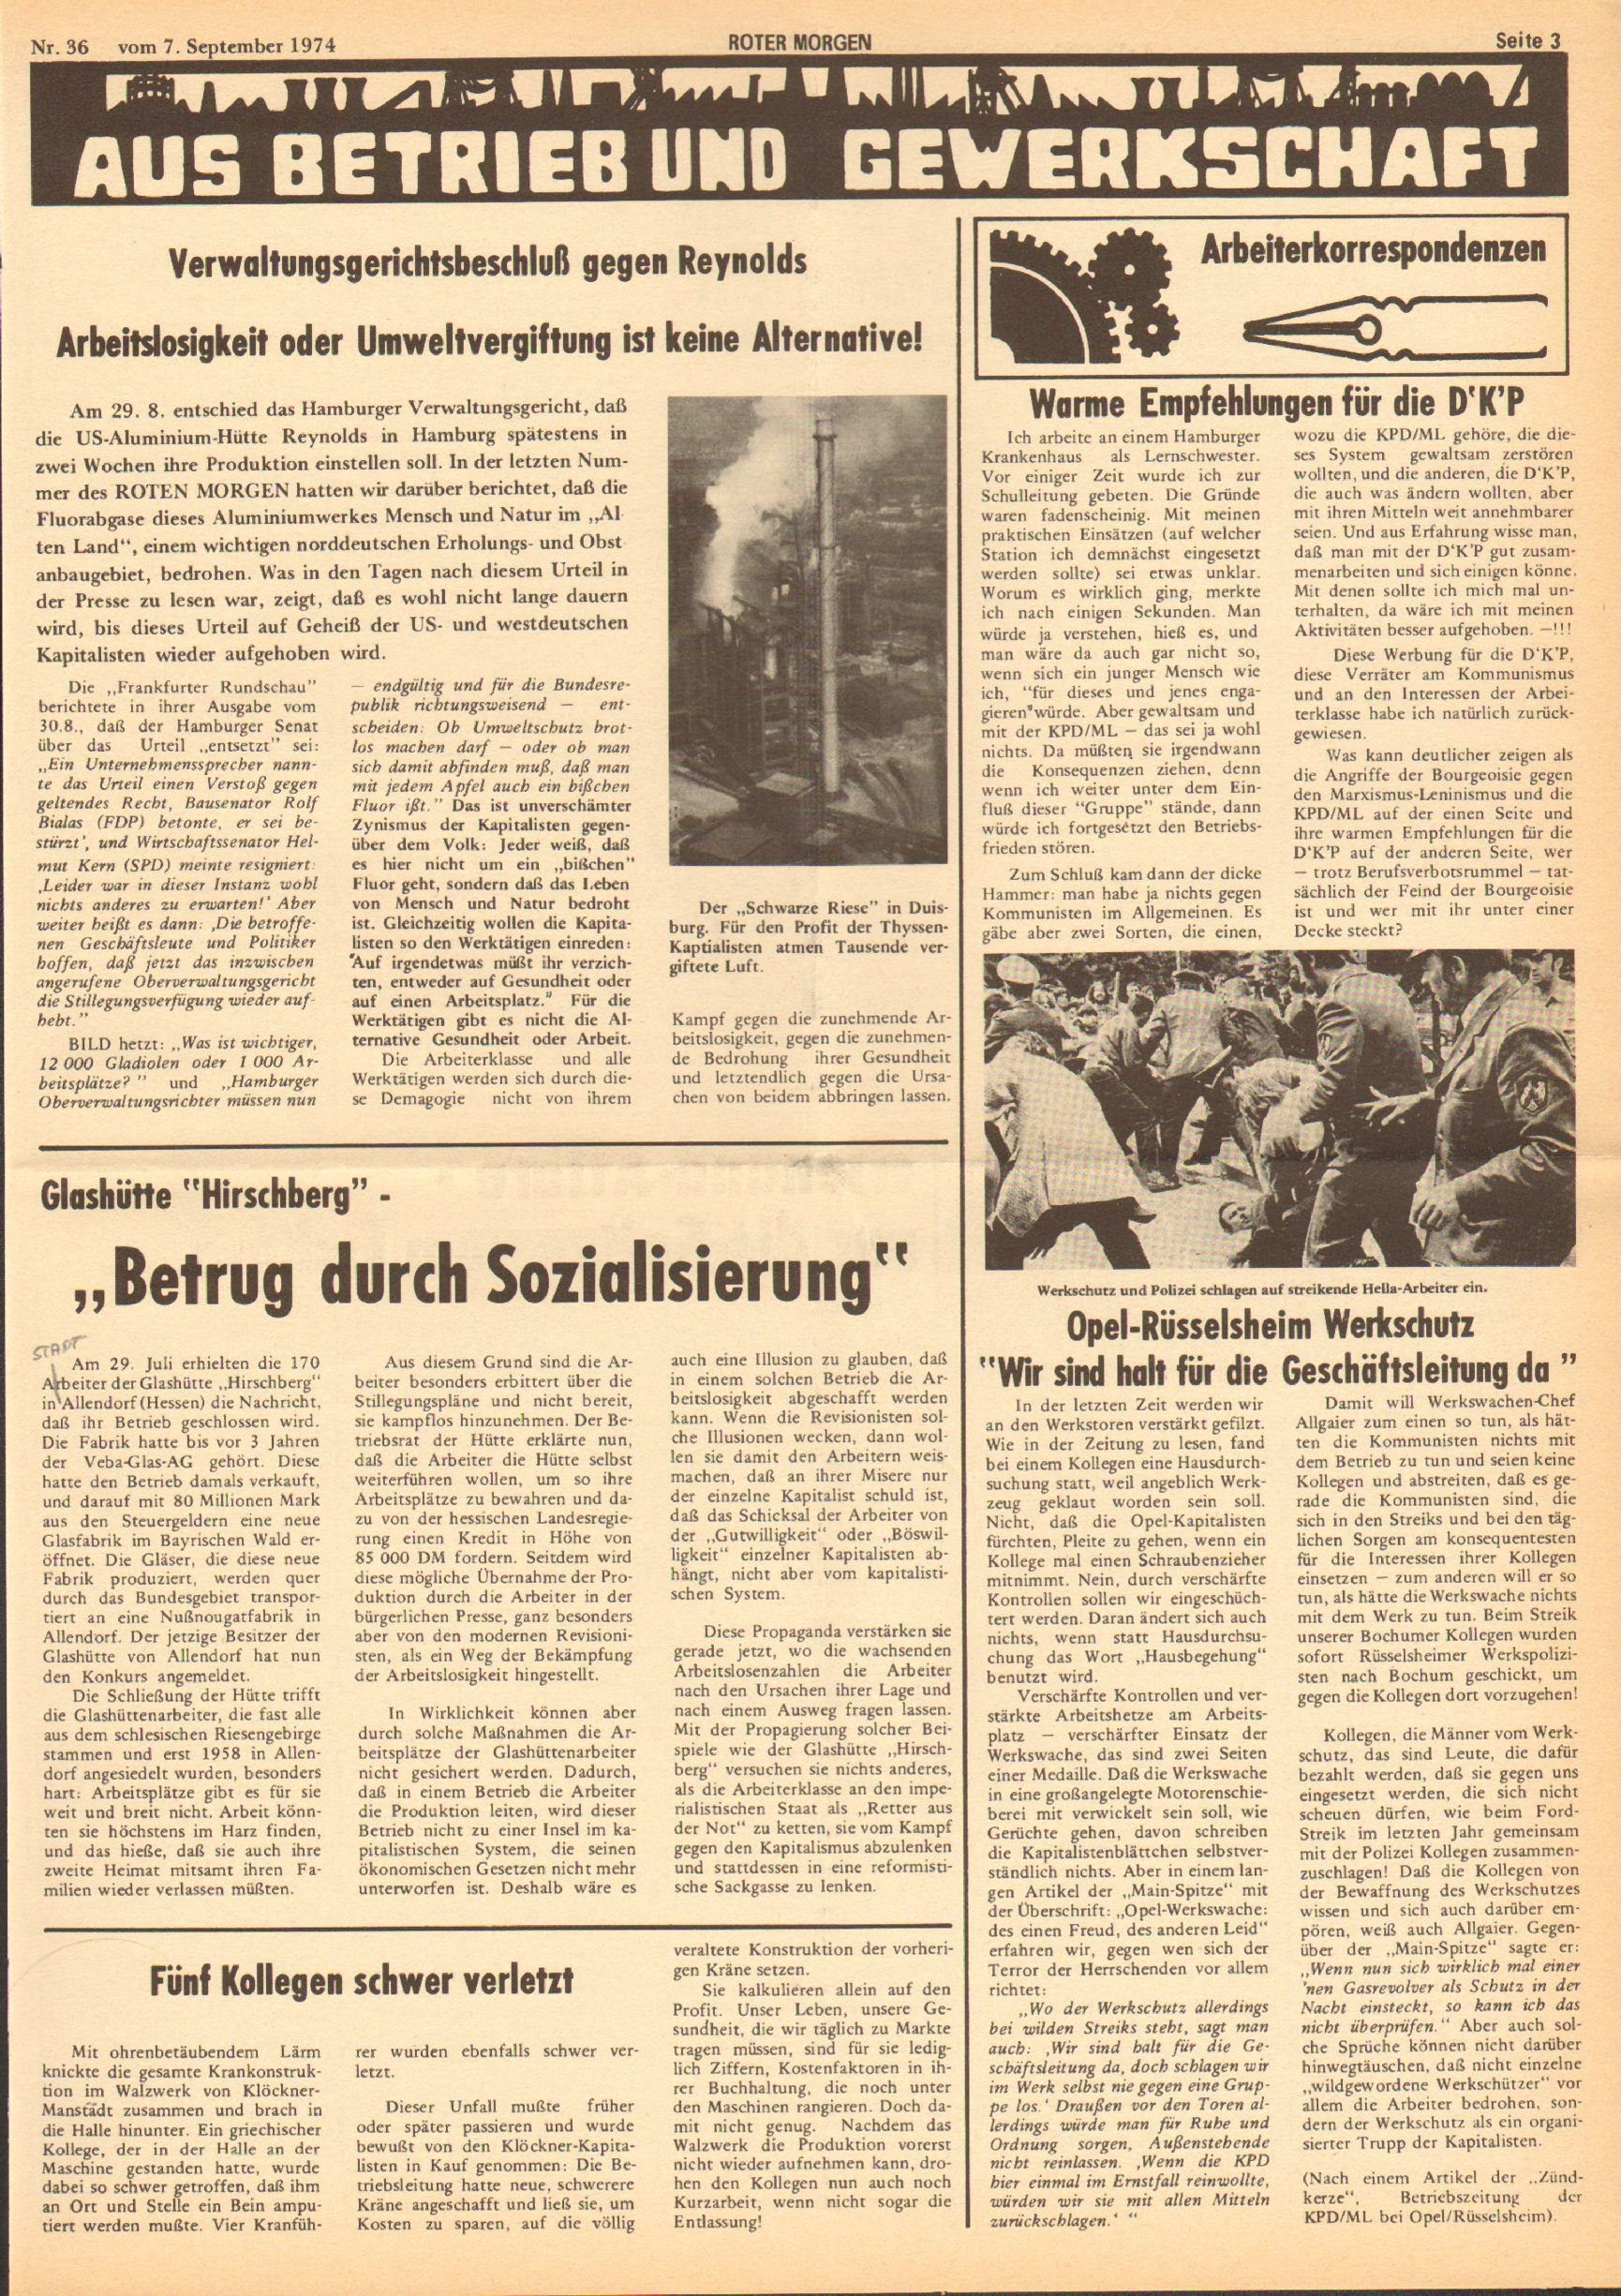 Roter Morgen, 8. Jg., 7. September 1974, Nr. 36, Seite 3